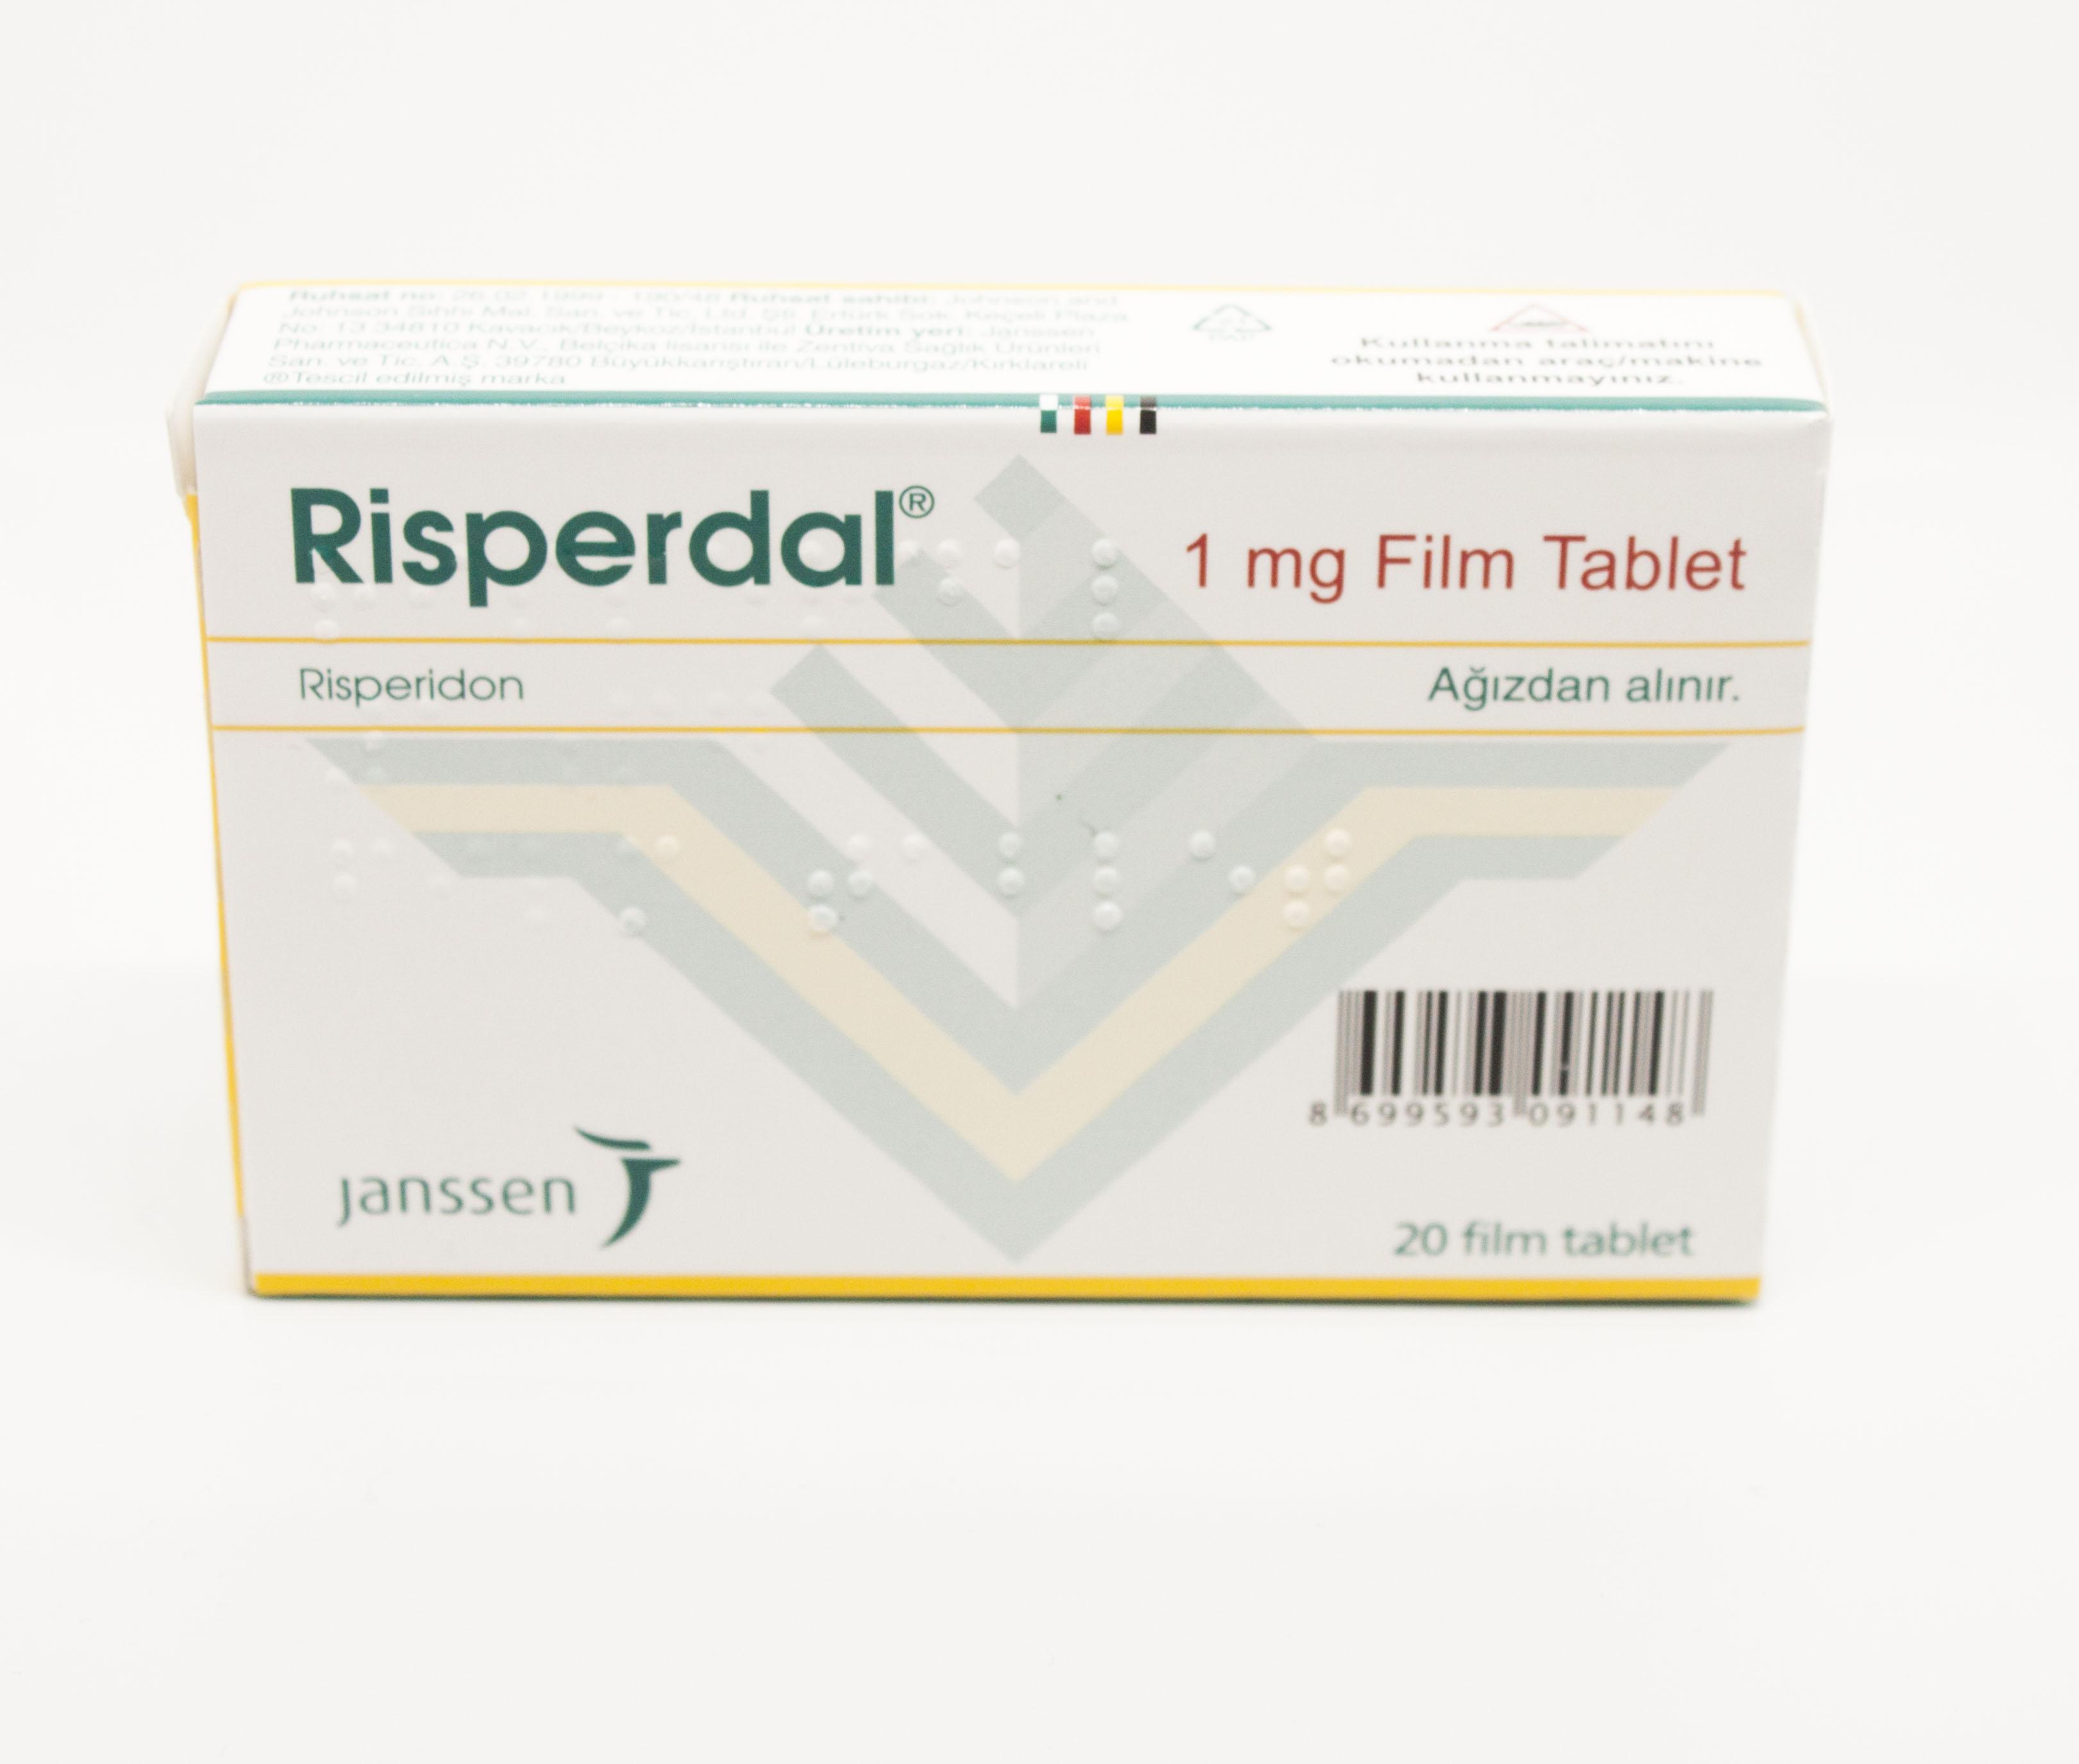 risperdal-1-mg-20-tablet-nasil-kullanilir